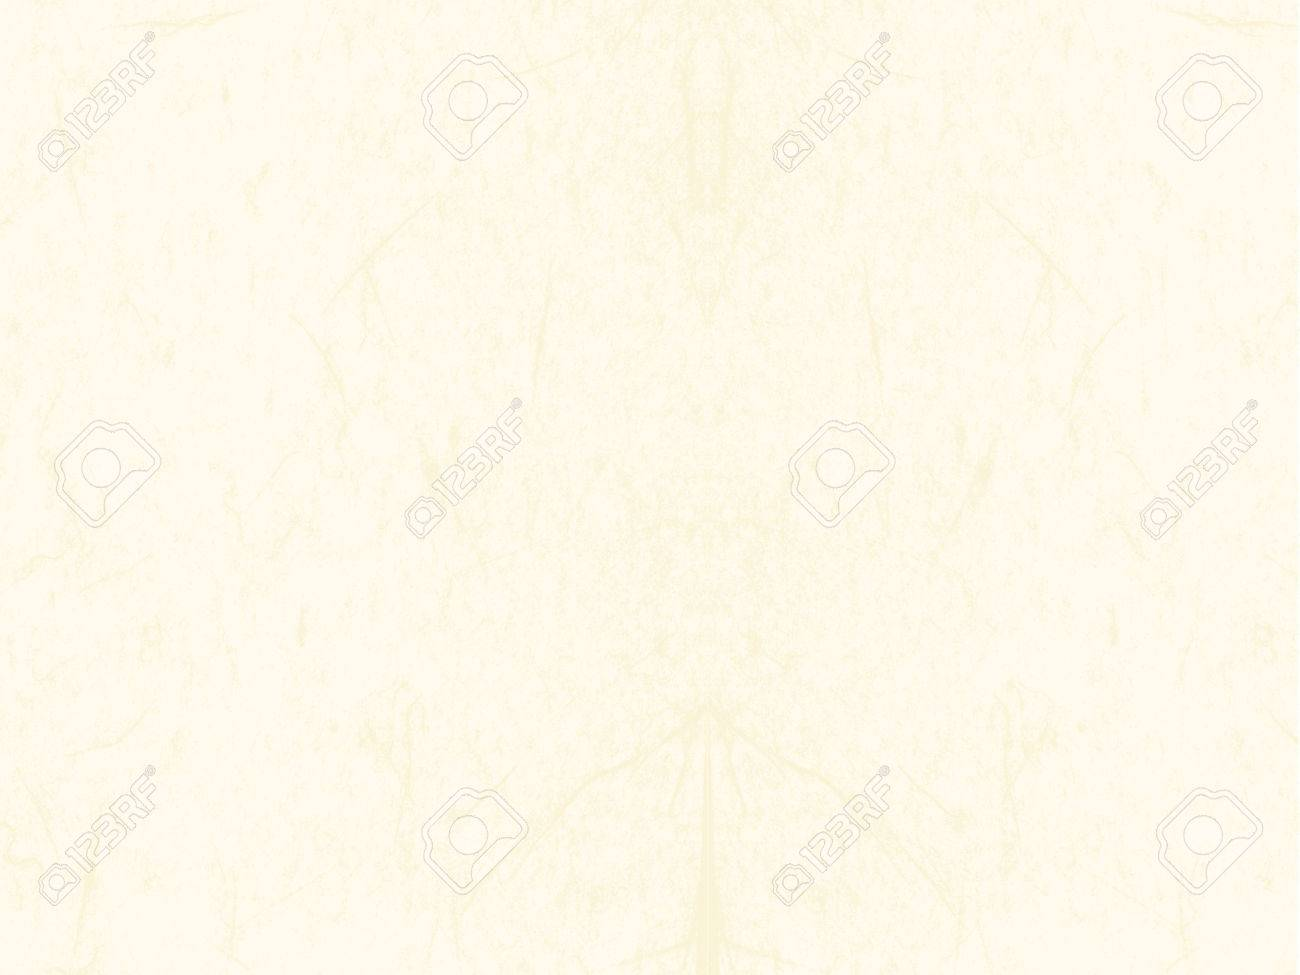 japanese paper - 63388121